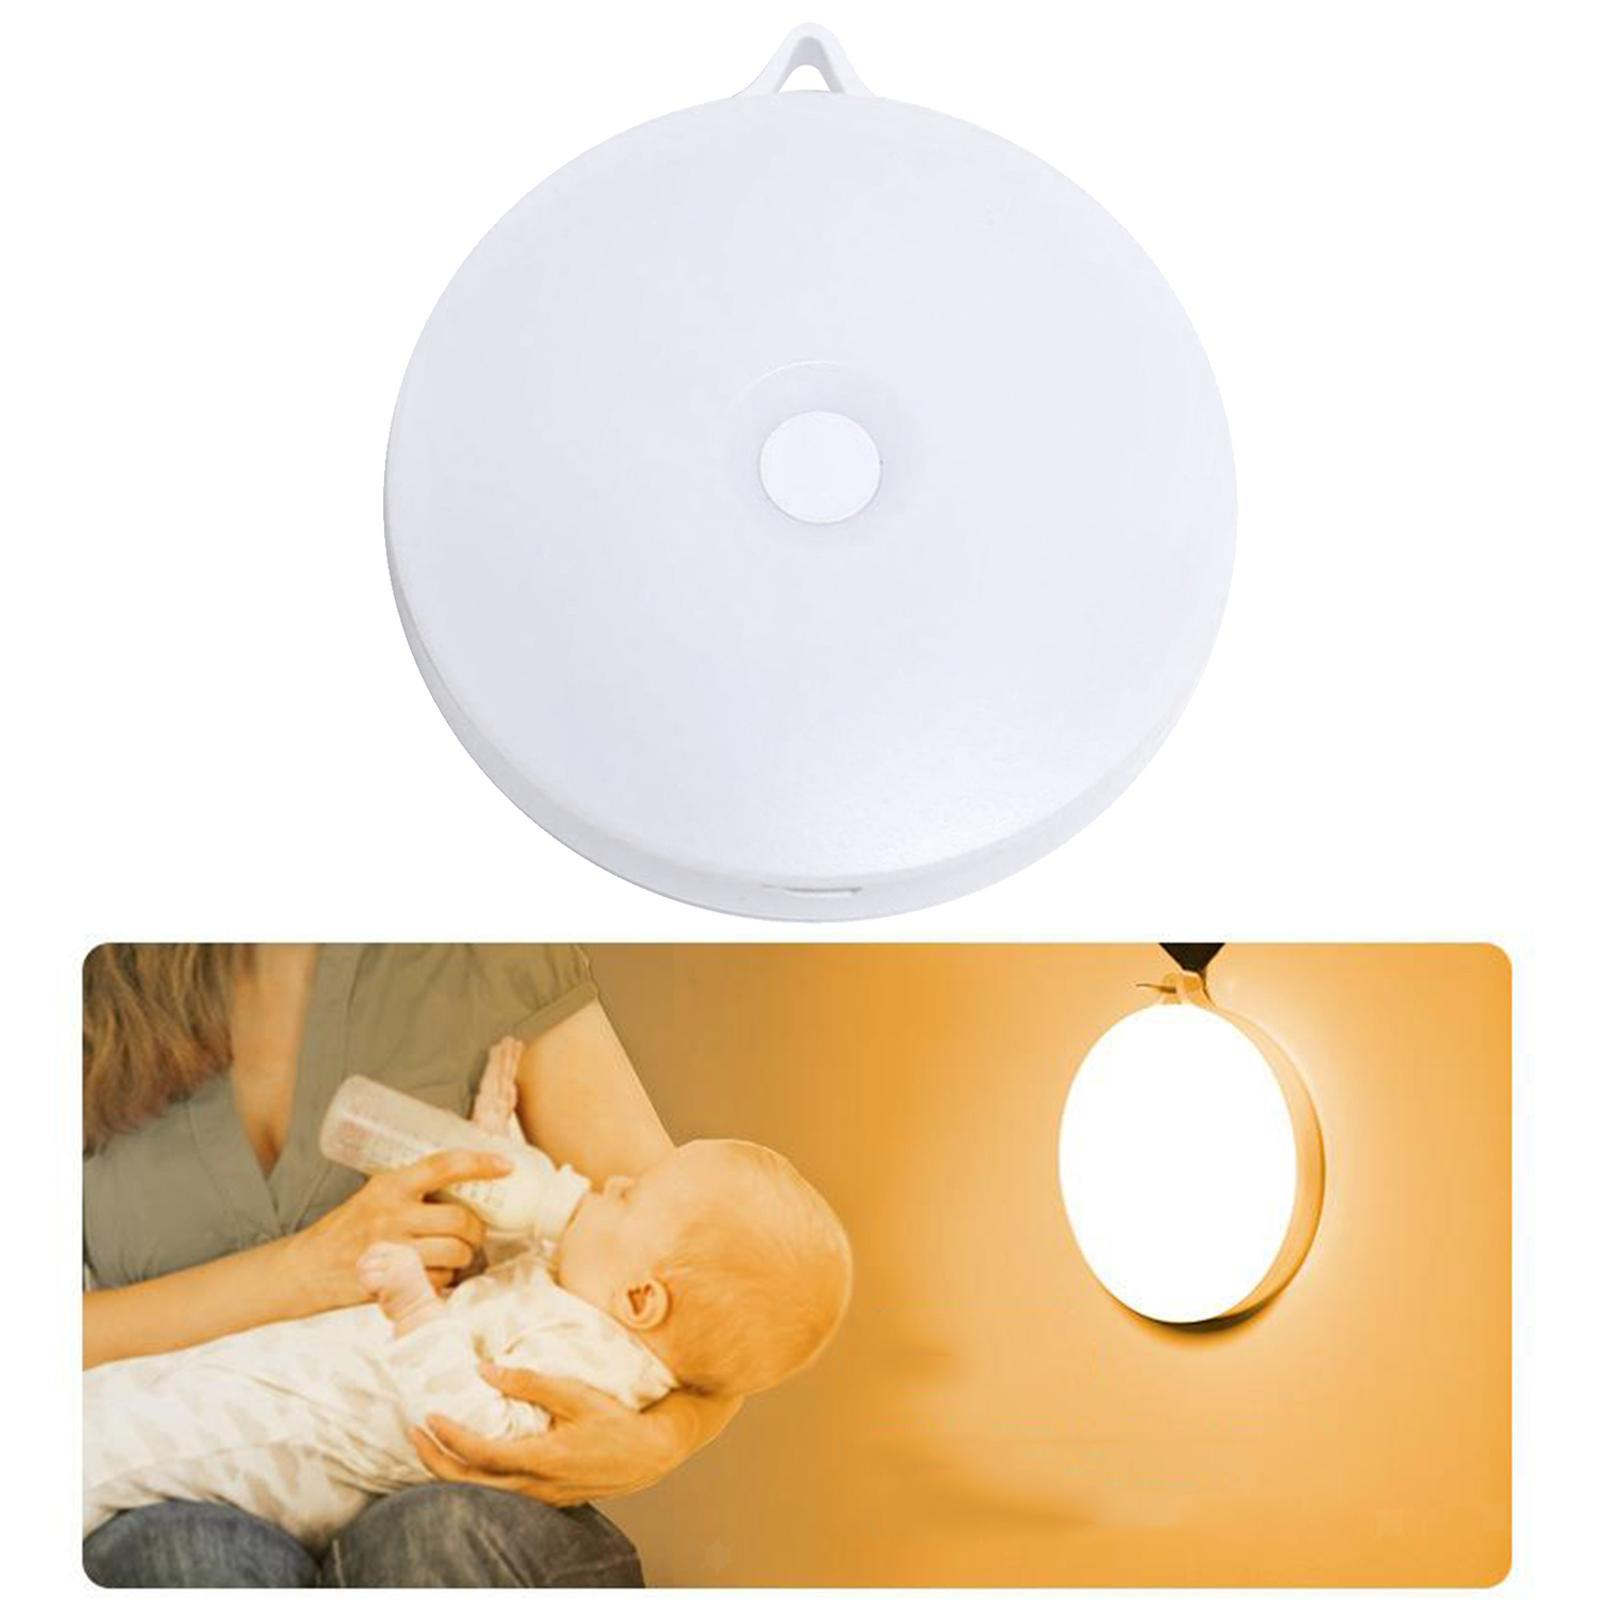 miniatura 5 - Luce notturna a LED per camera da letto ricaricabile USB per Hotel con sensore